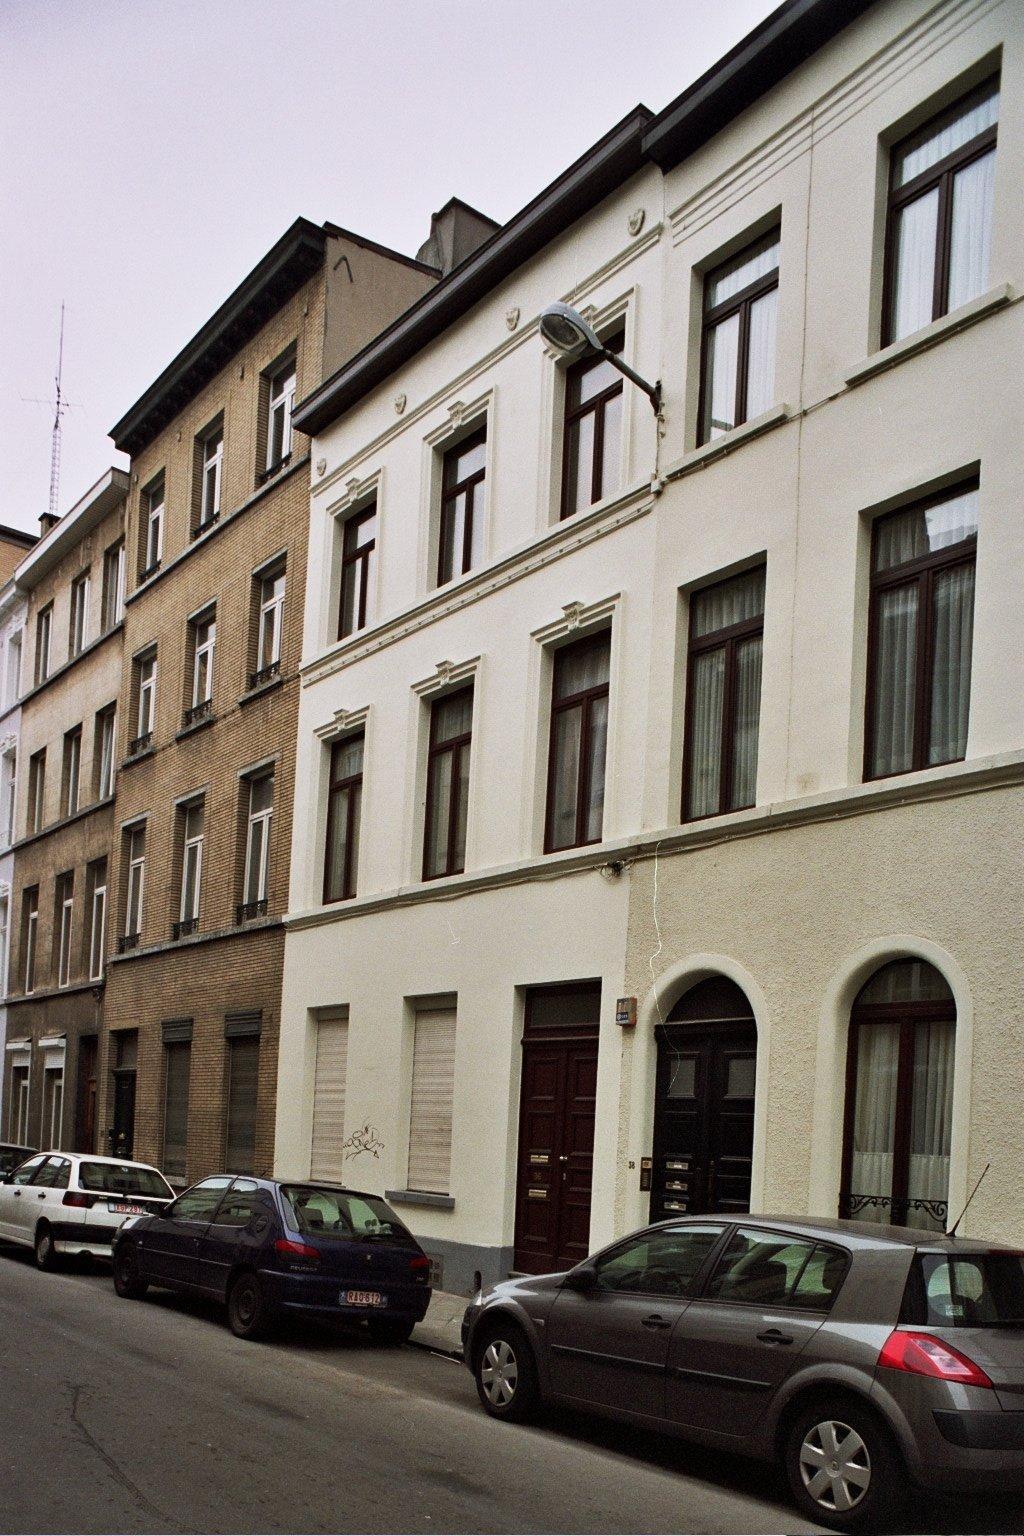 Rue d'Alsace Lorraine 36., 2008